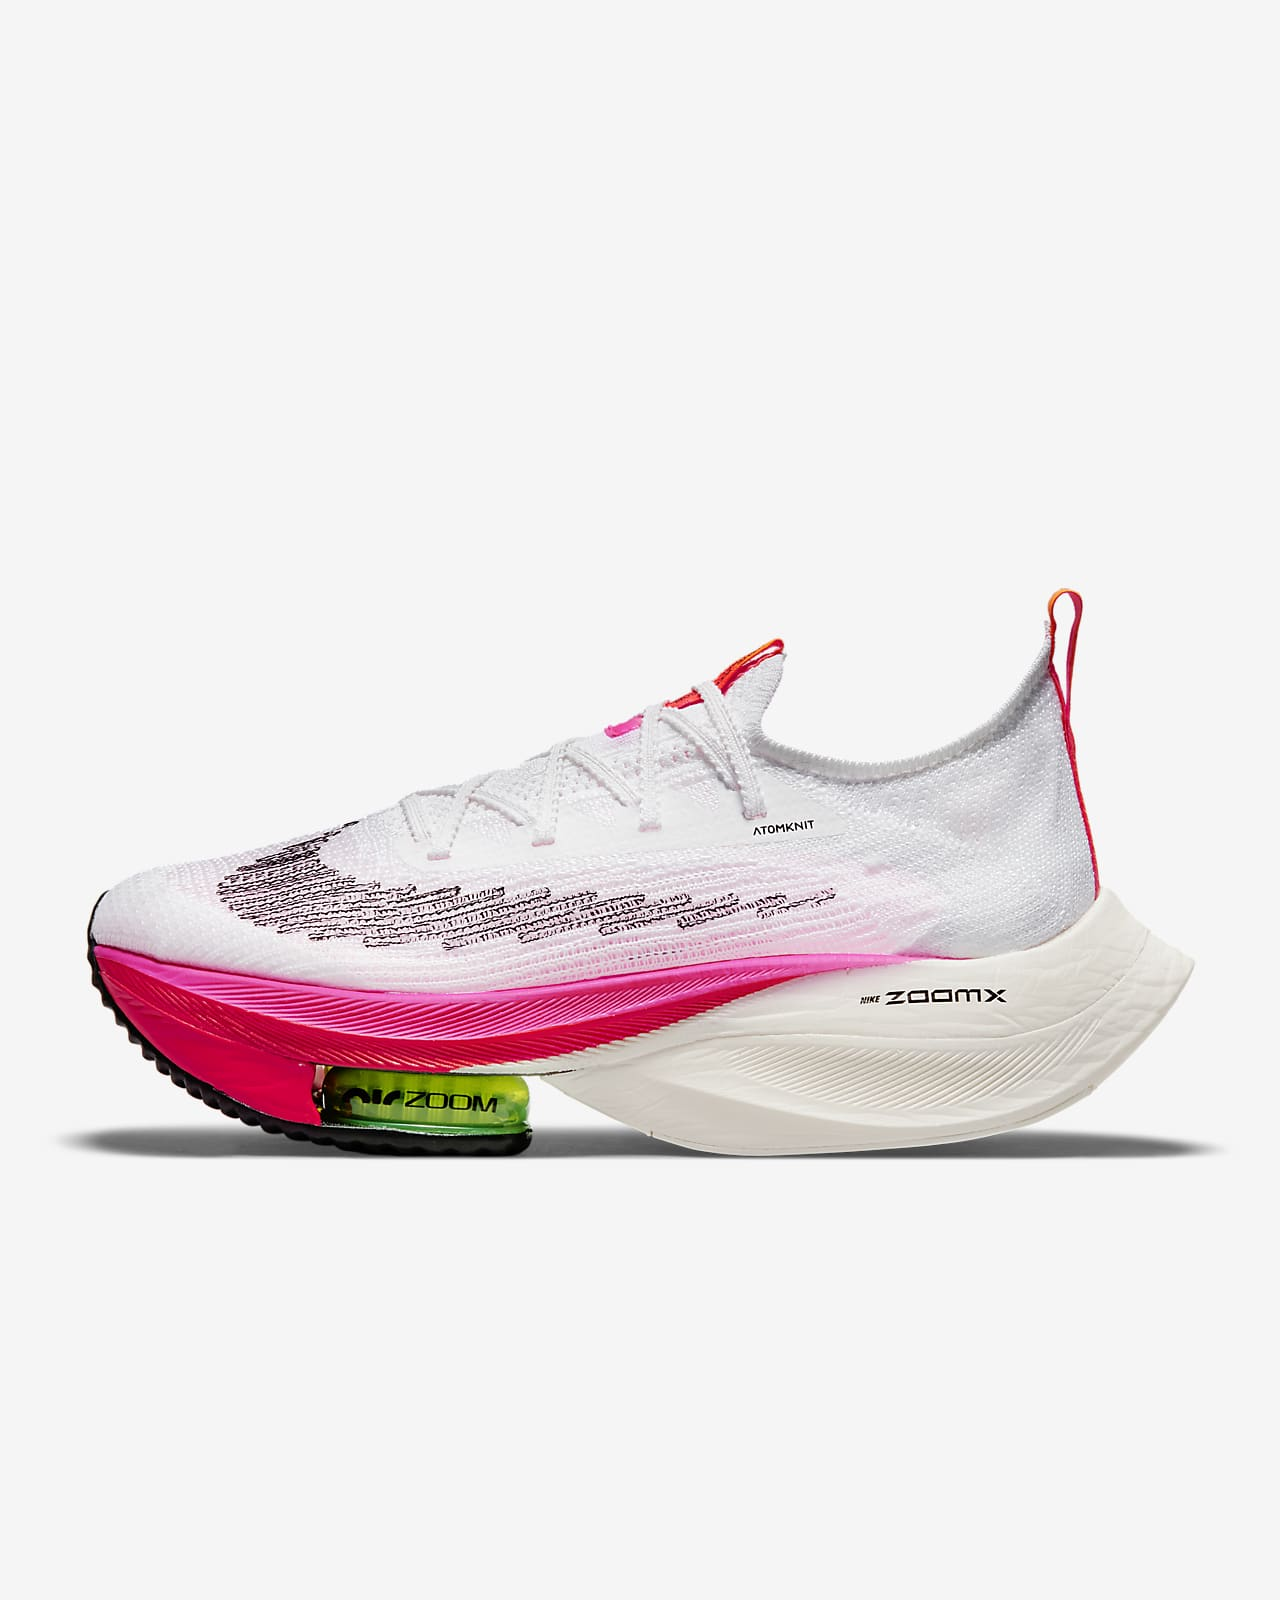 Nike Air Zoom Alphafly NEXT% Flyknit Women's Road Racing Shoe